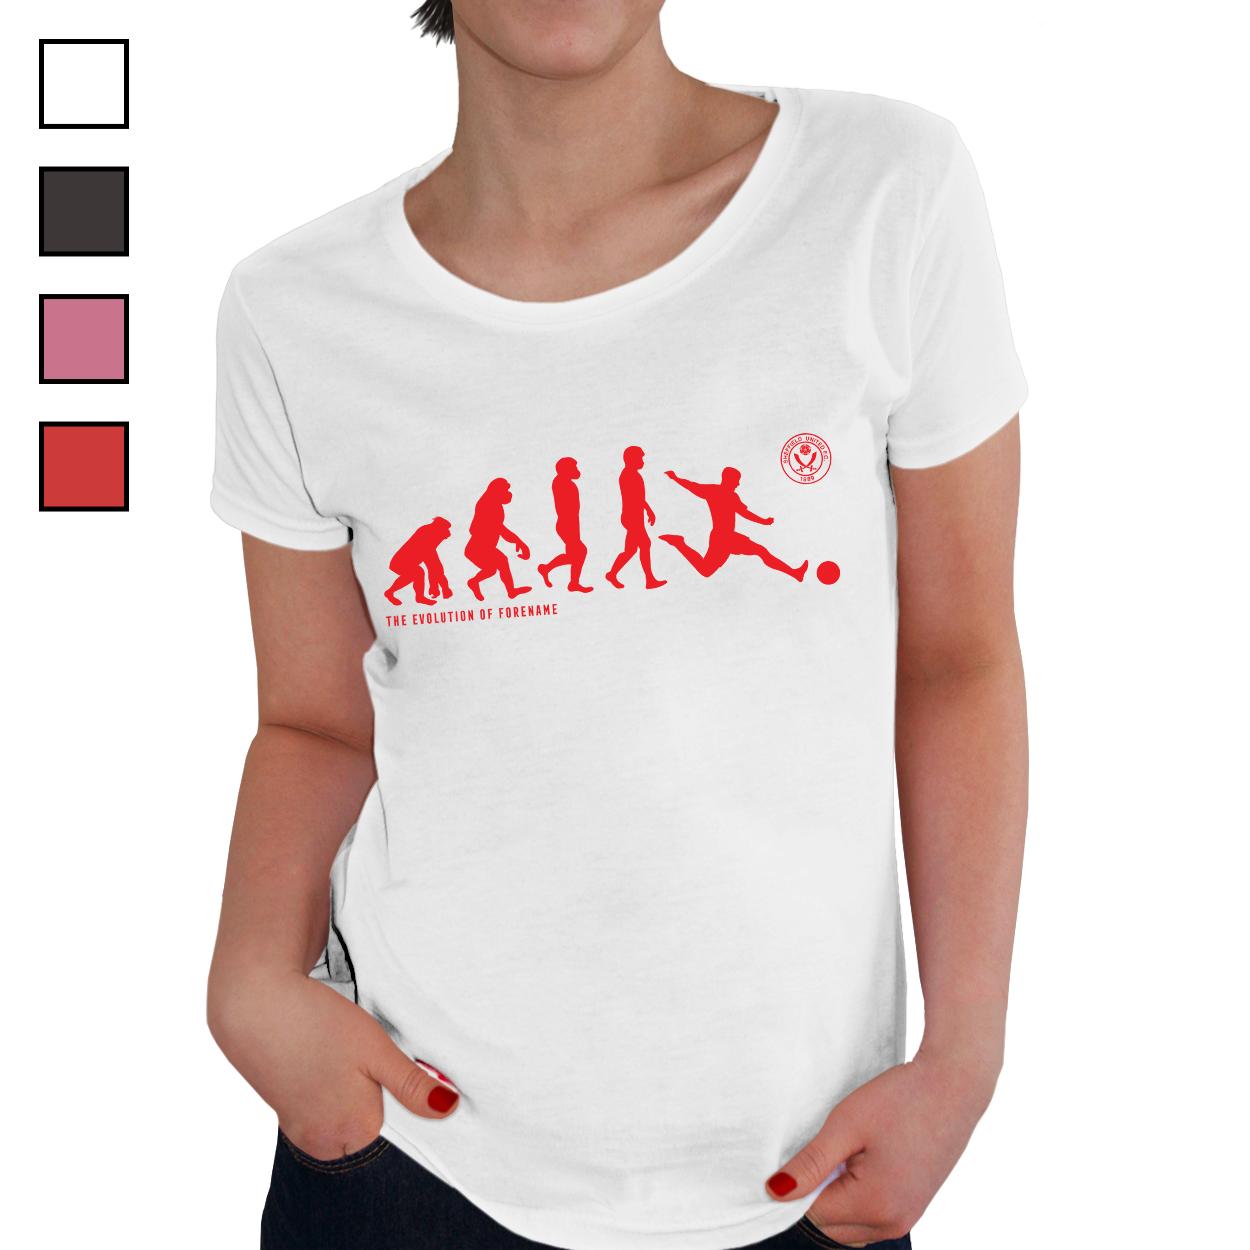 Sheffield United FC Evolution Ladies T-Shirt